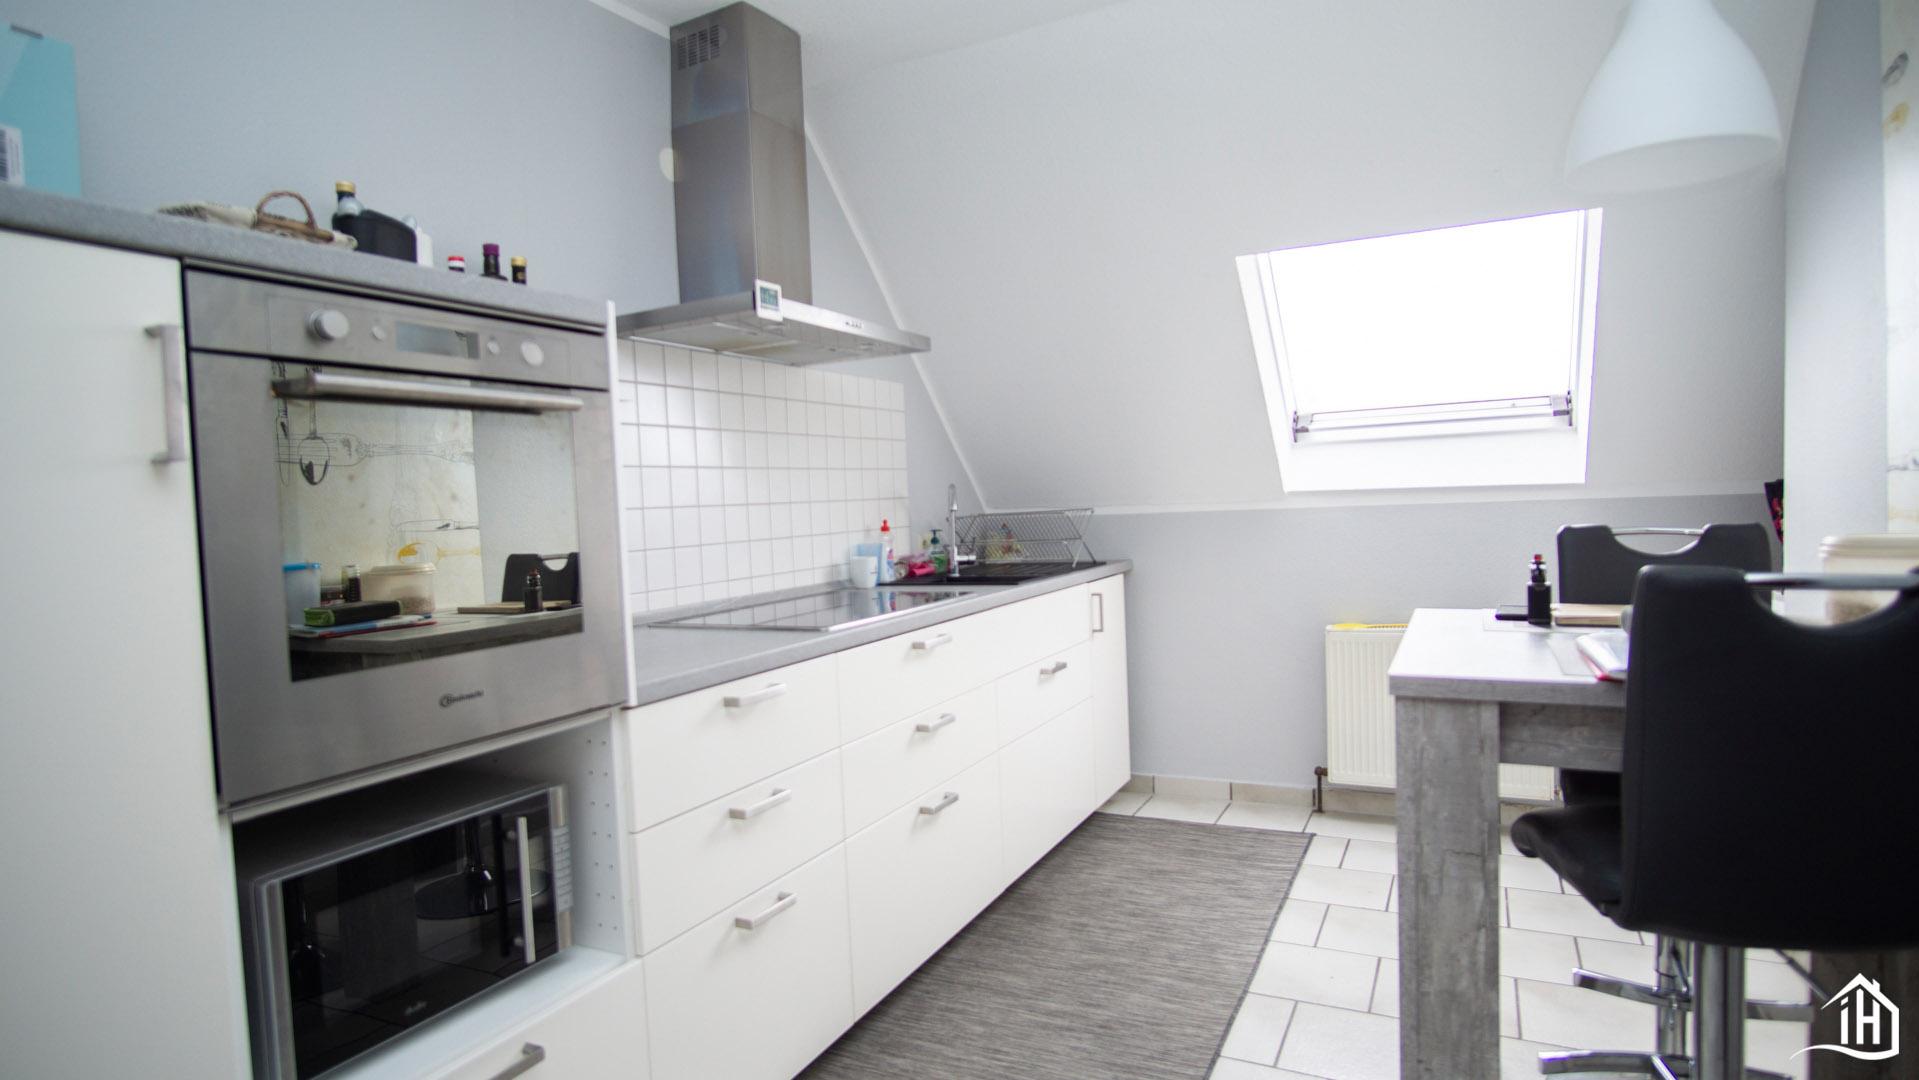 Immobilien Hahnefeld 79468349 Küche